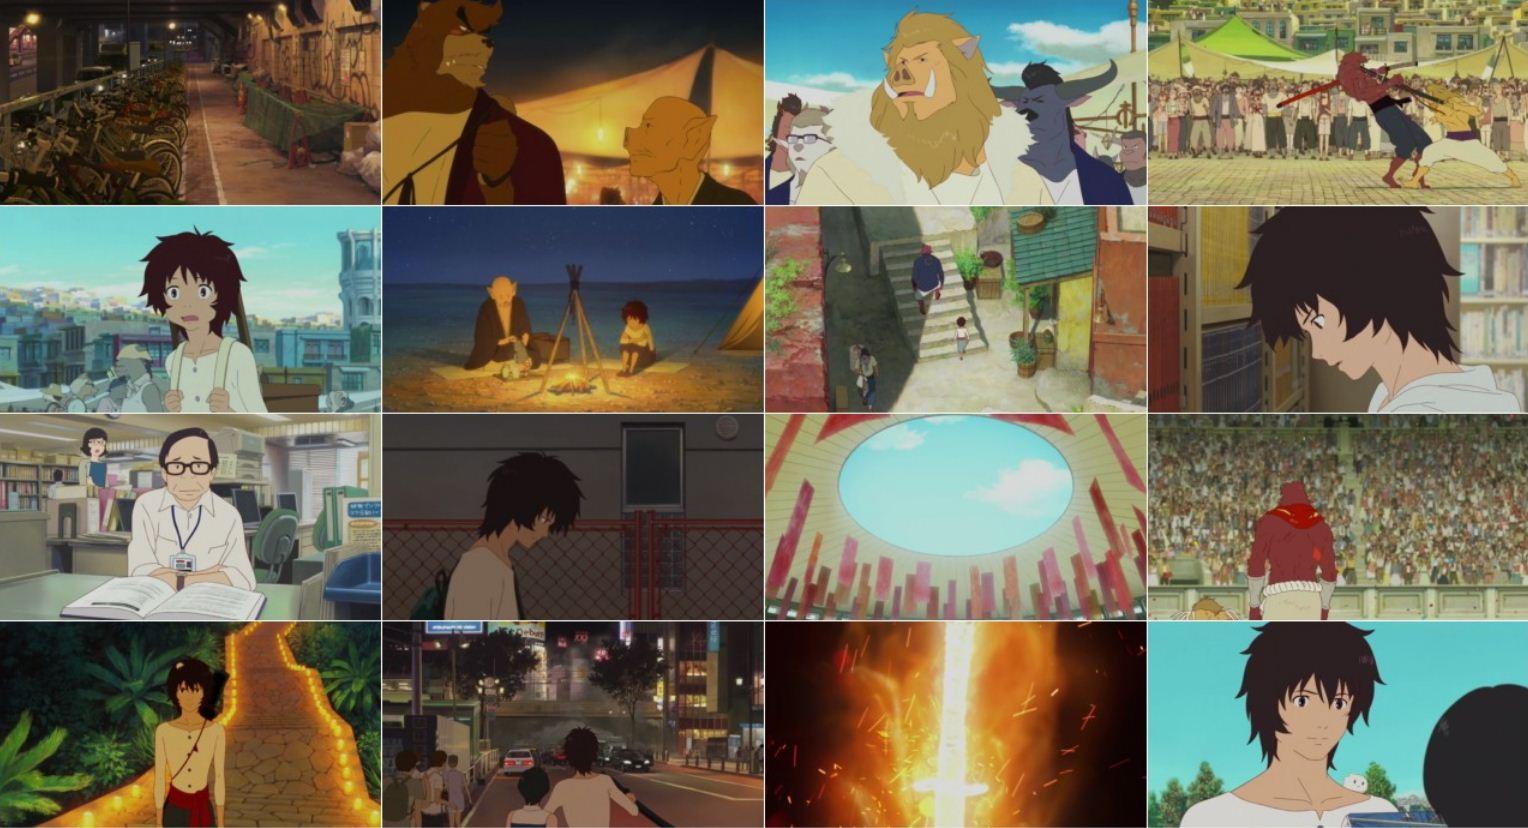 The Boy and the Beast 2 دانلود دوبله فارسی انیمیشن پسر بچه و هیولا